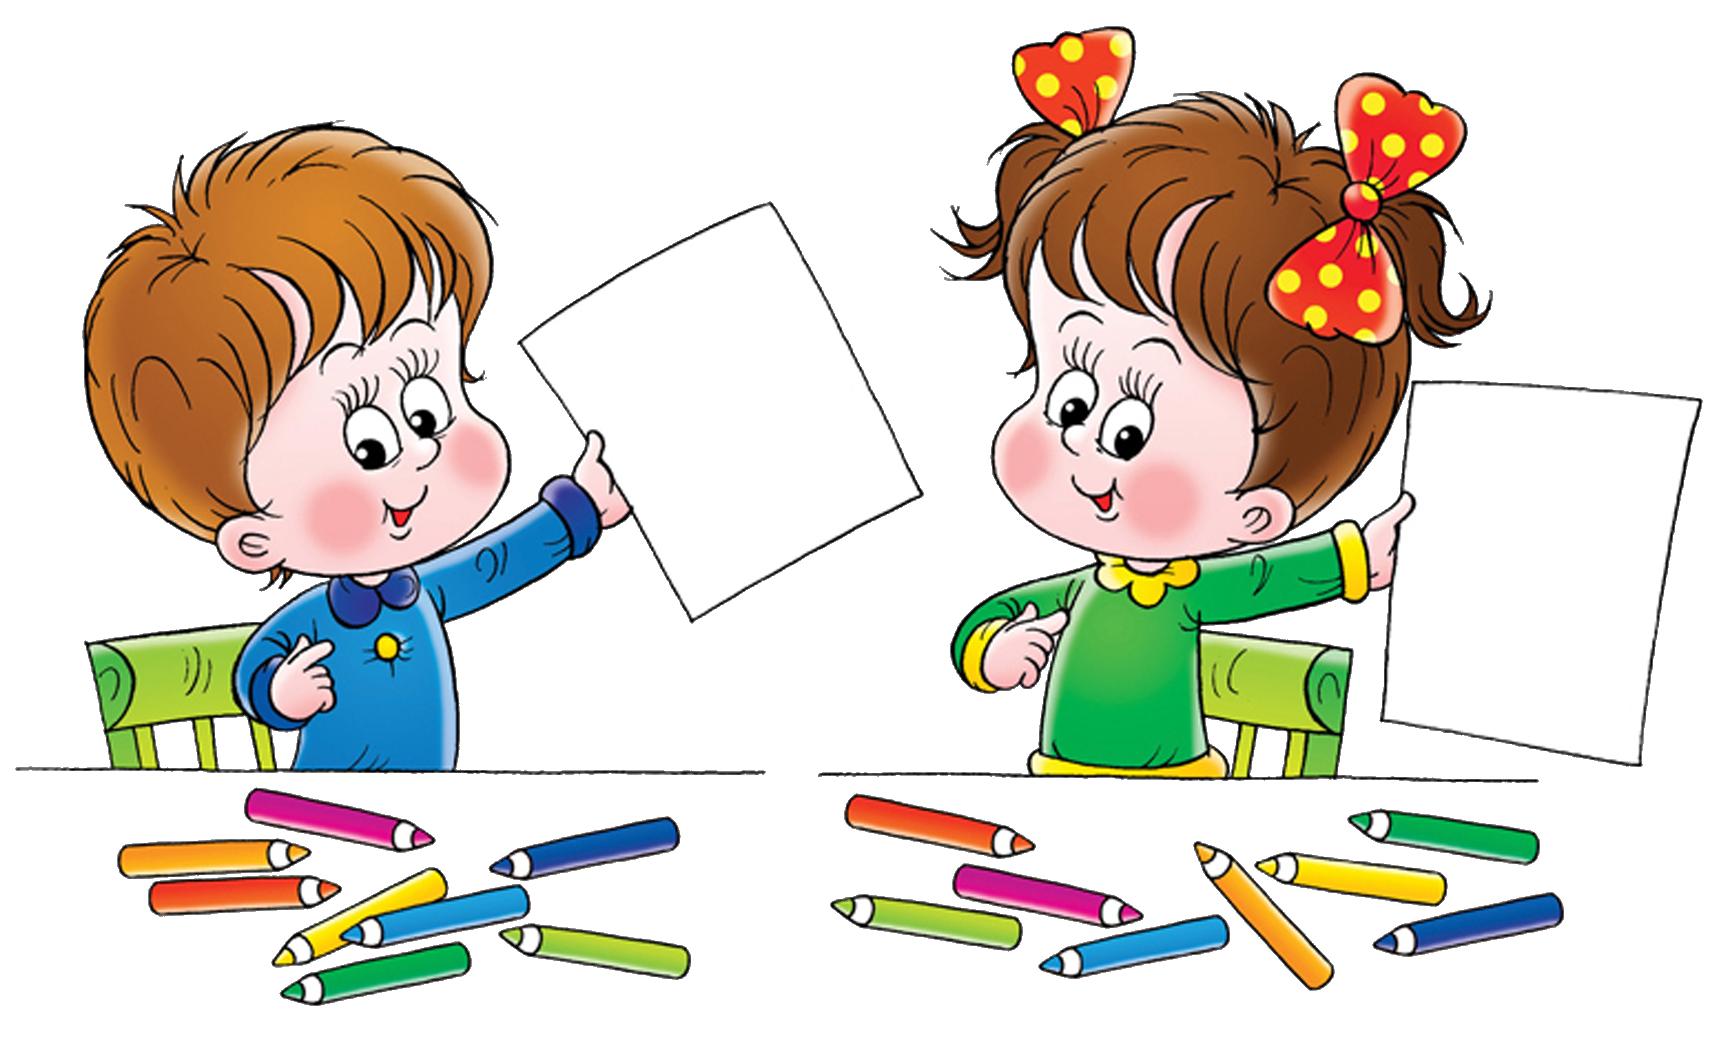 Schedule clipart kindergarten. Podobny obraz rozk ad